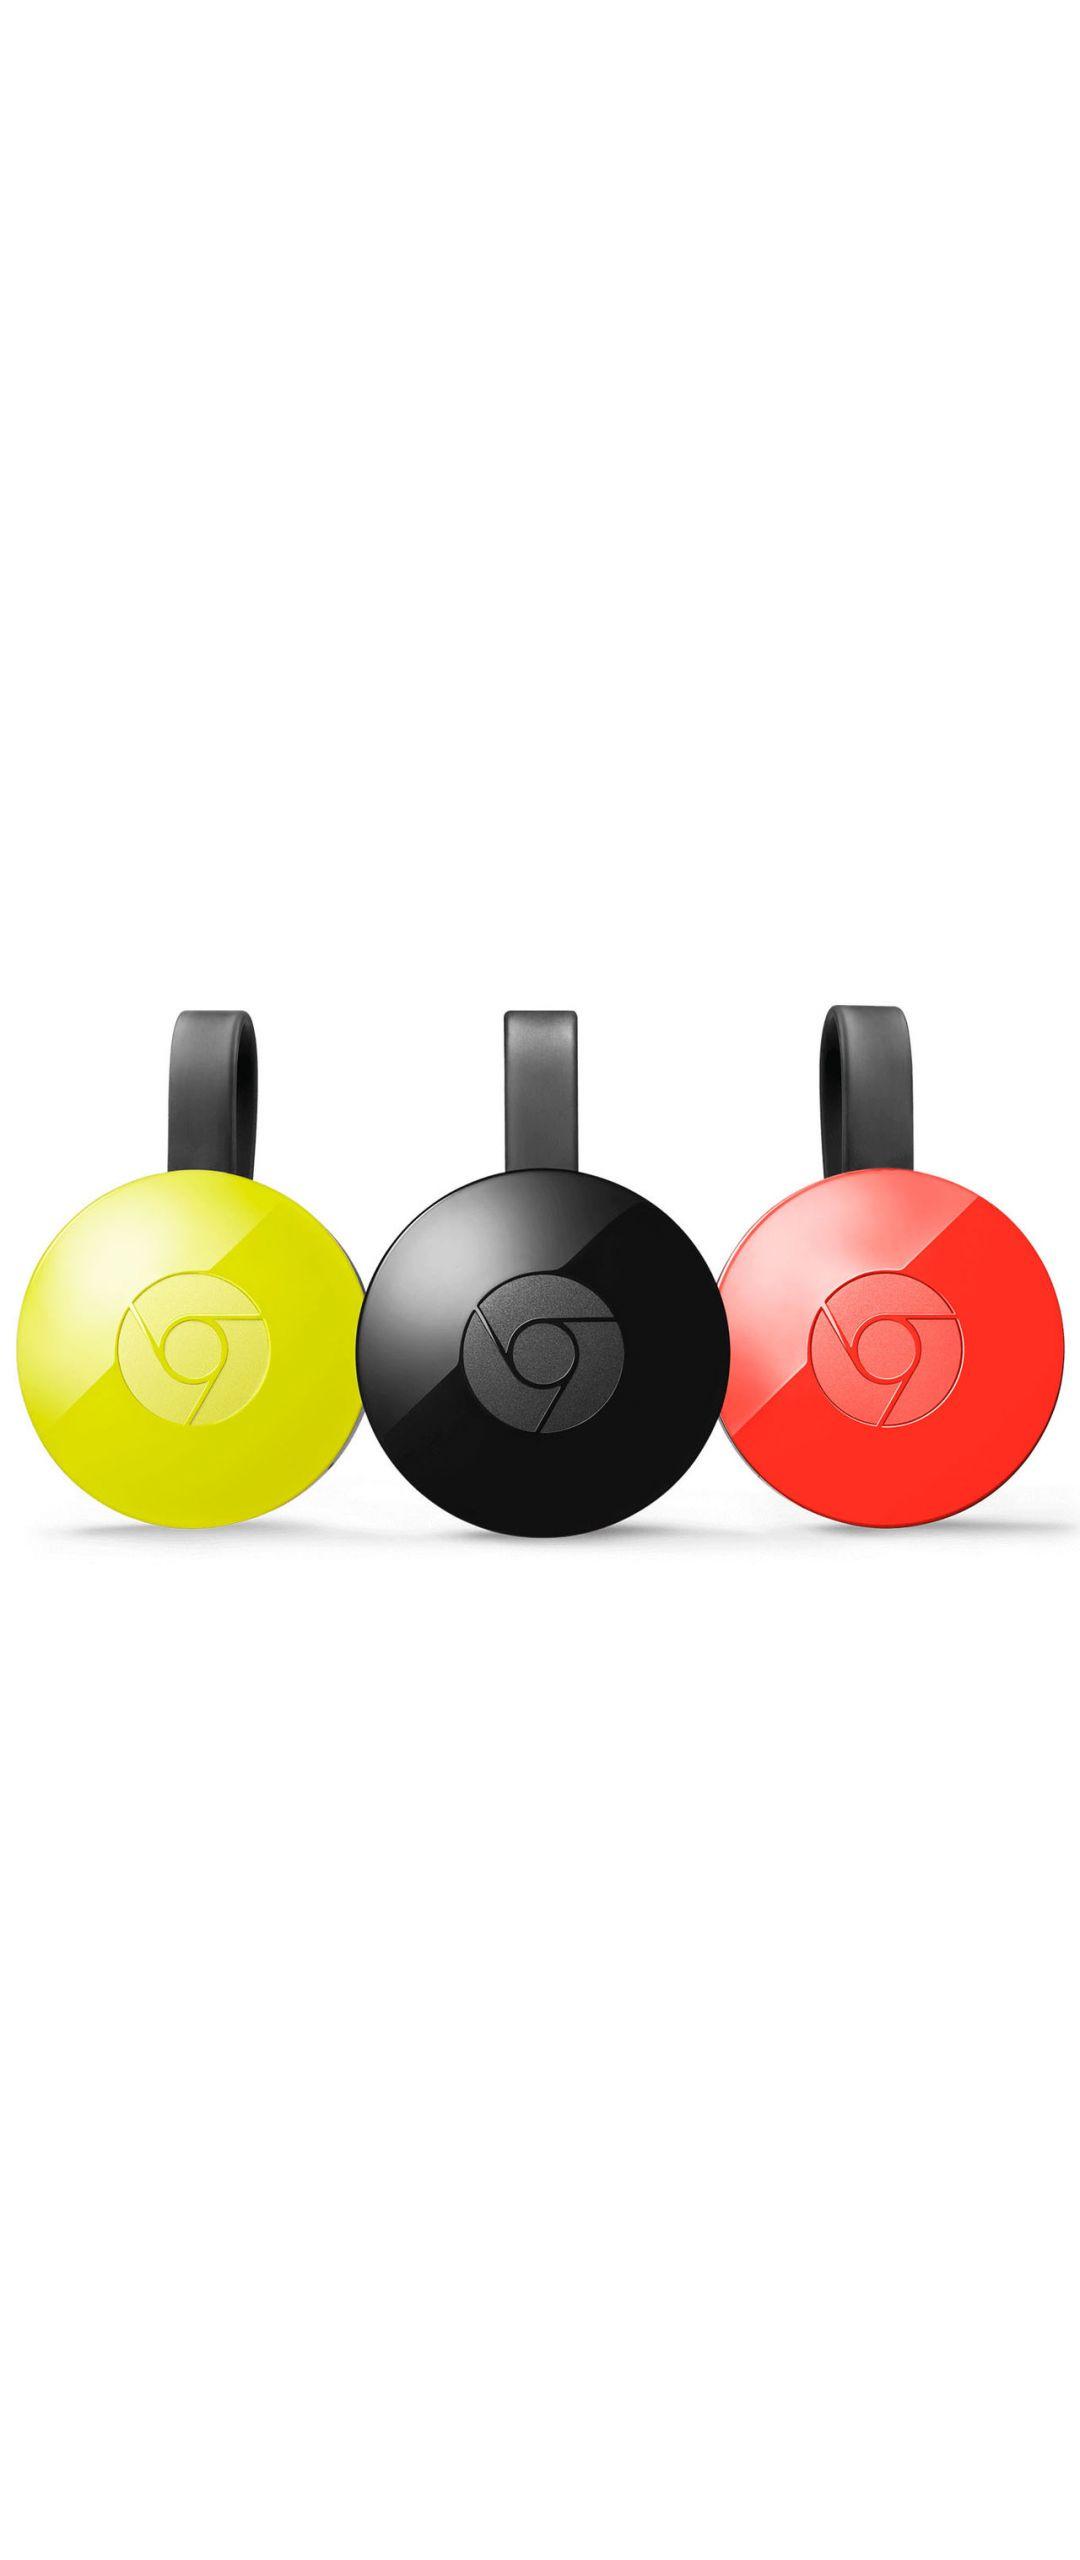 Chromecast integrar�a pronto streaming de videos subidos a Facebook